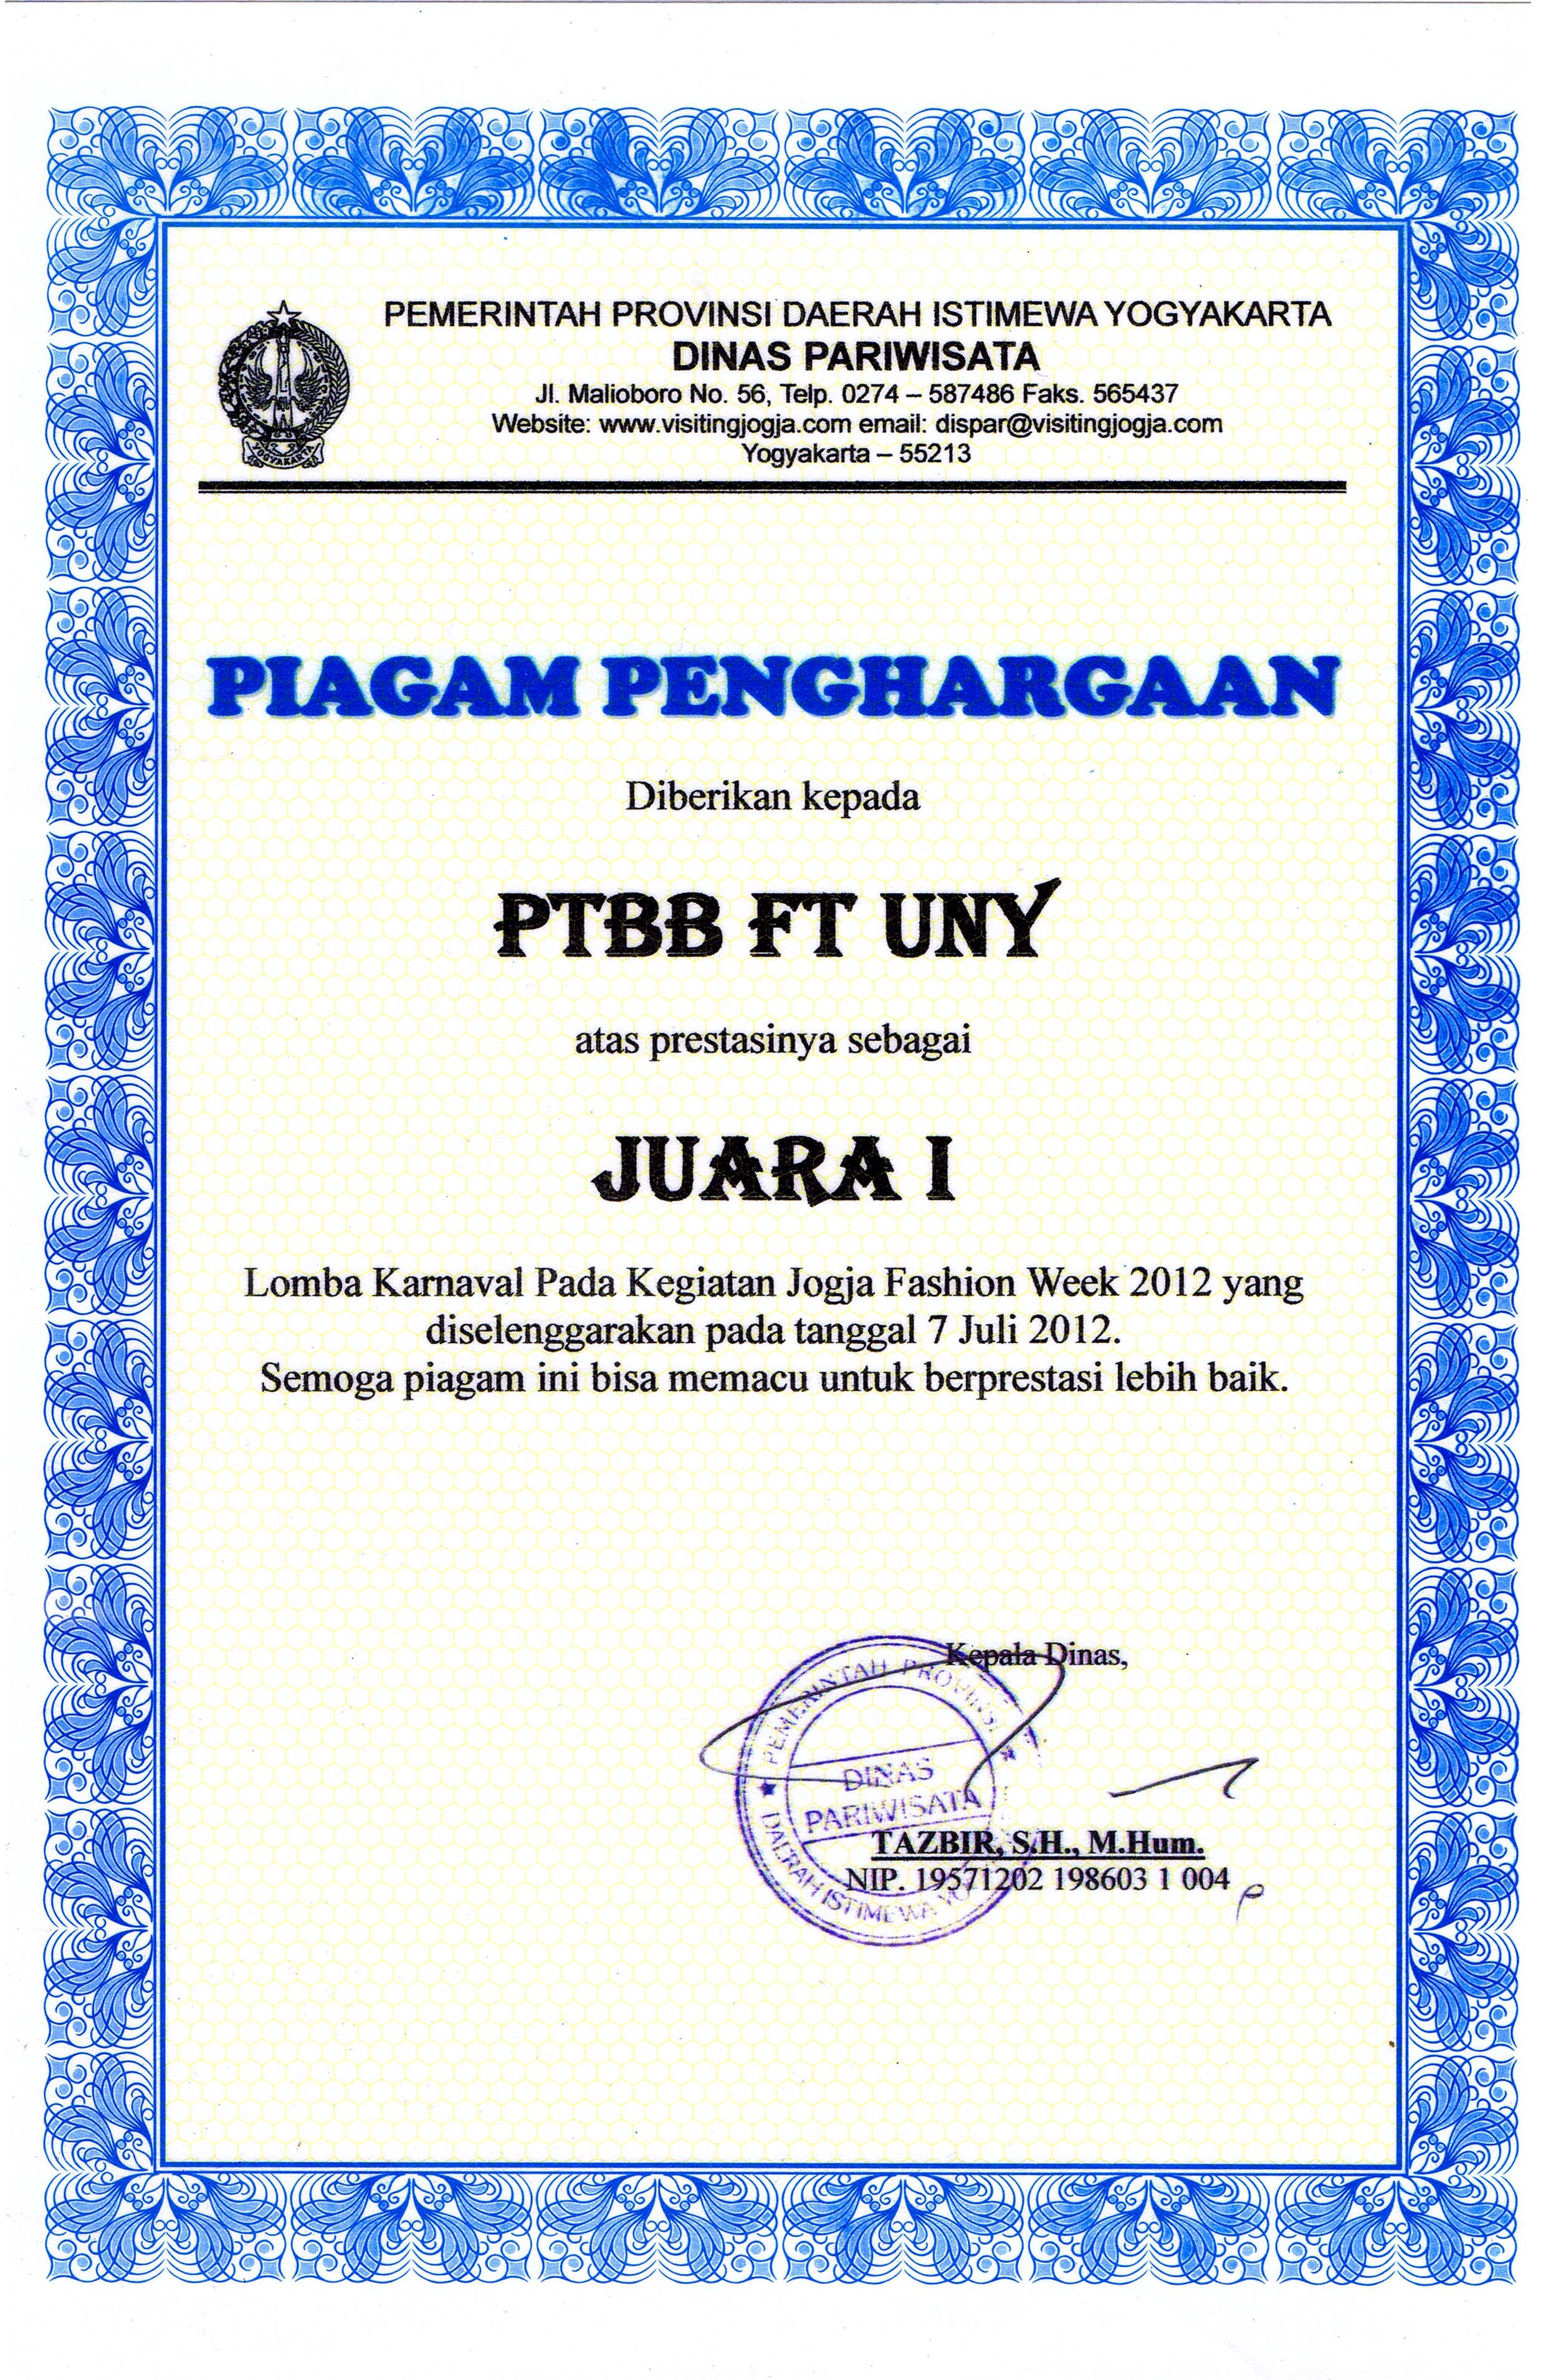 Afif Ghurub Bestari M Pd Staff Site Universitas Negeri Yogyakarta